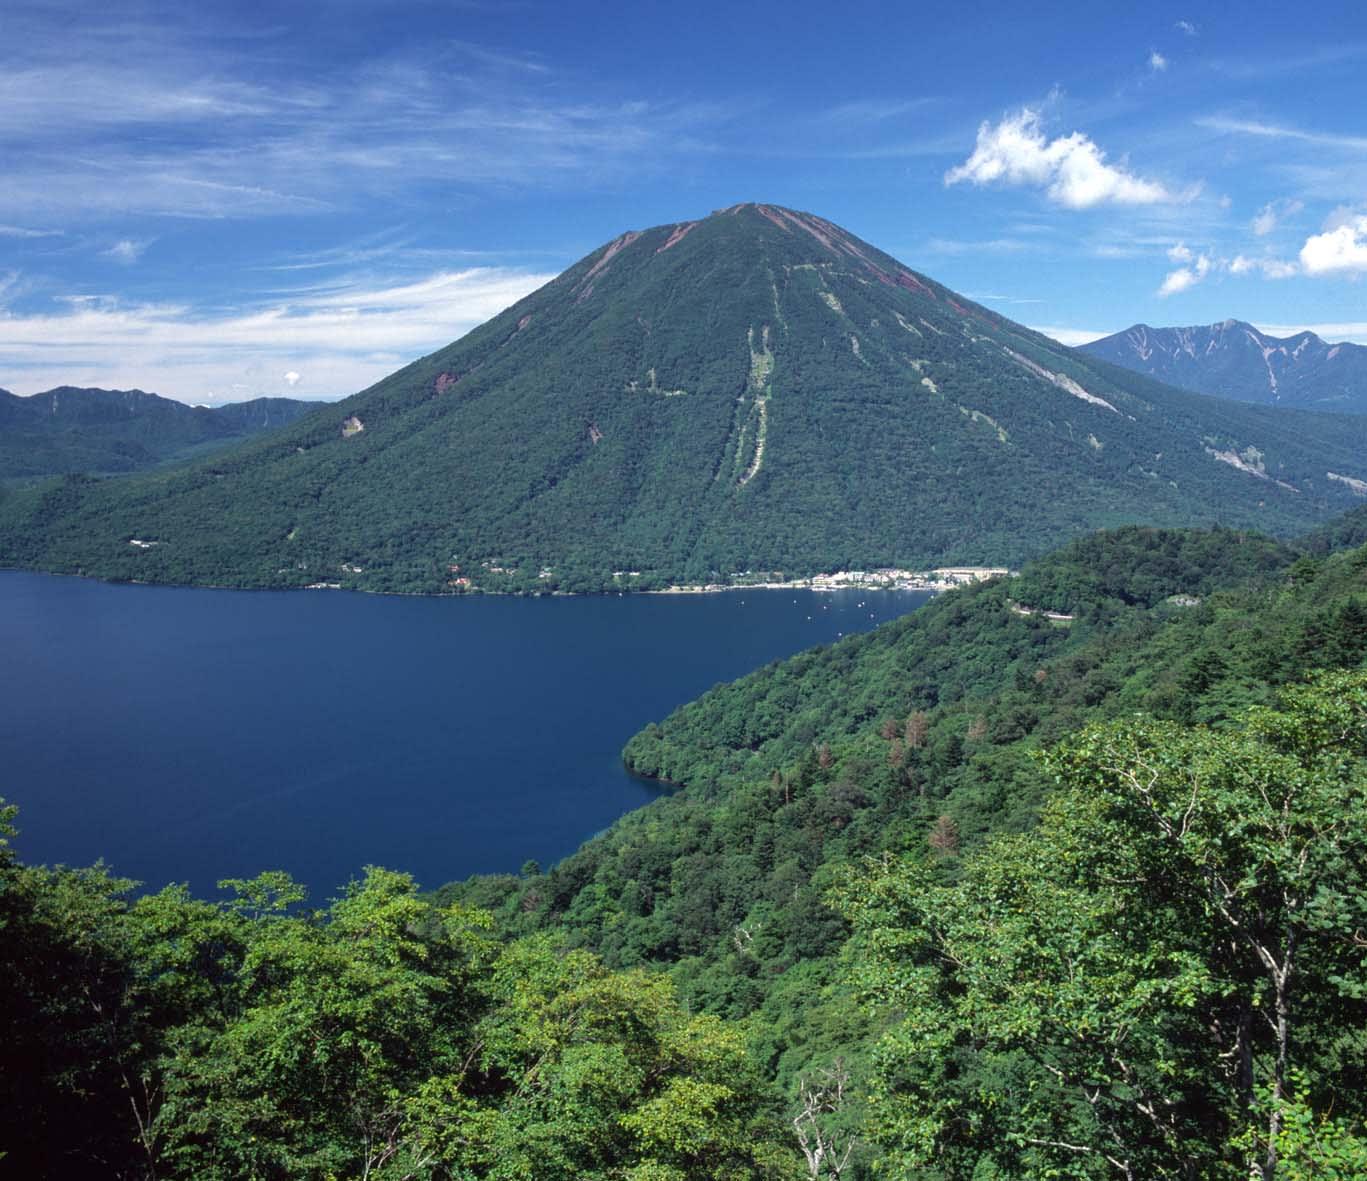 http://blogimg.goo.ne.jp/user_image/72/f2/10f7d4adfcf100f79449dd14c8983959.jpg